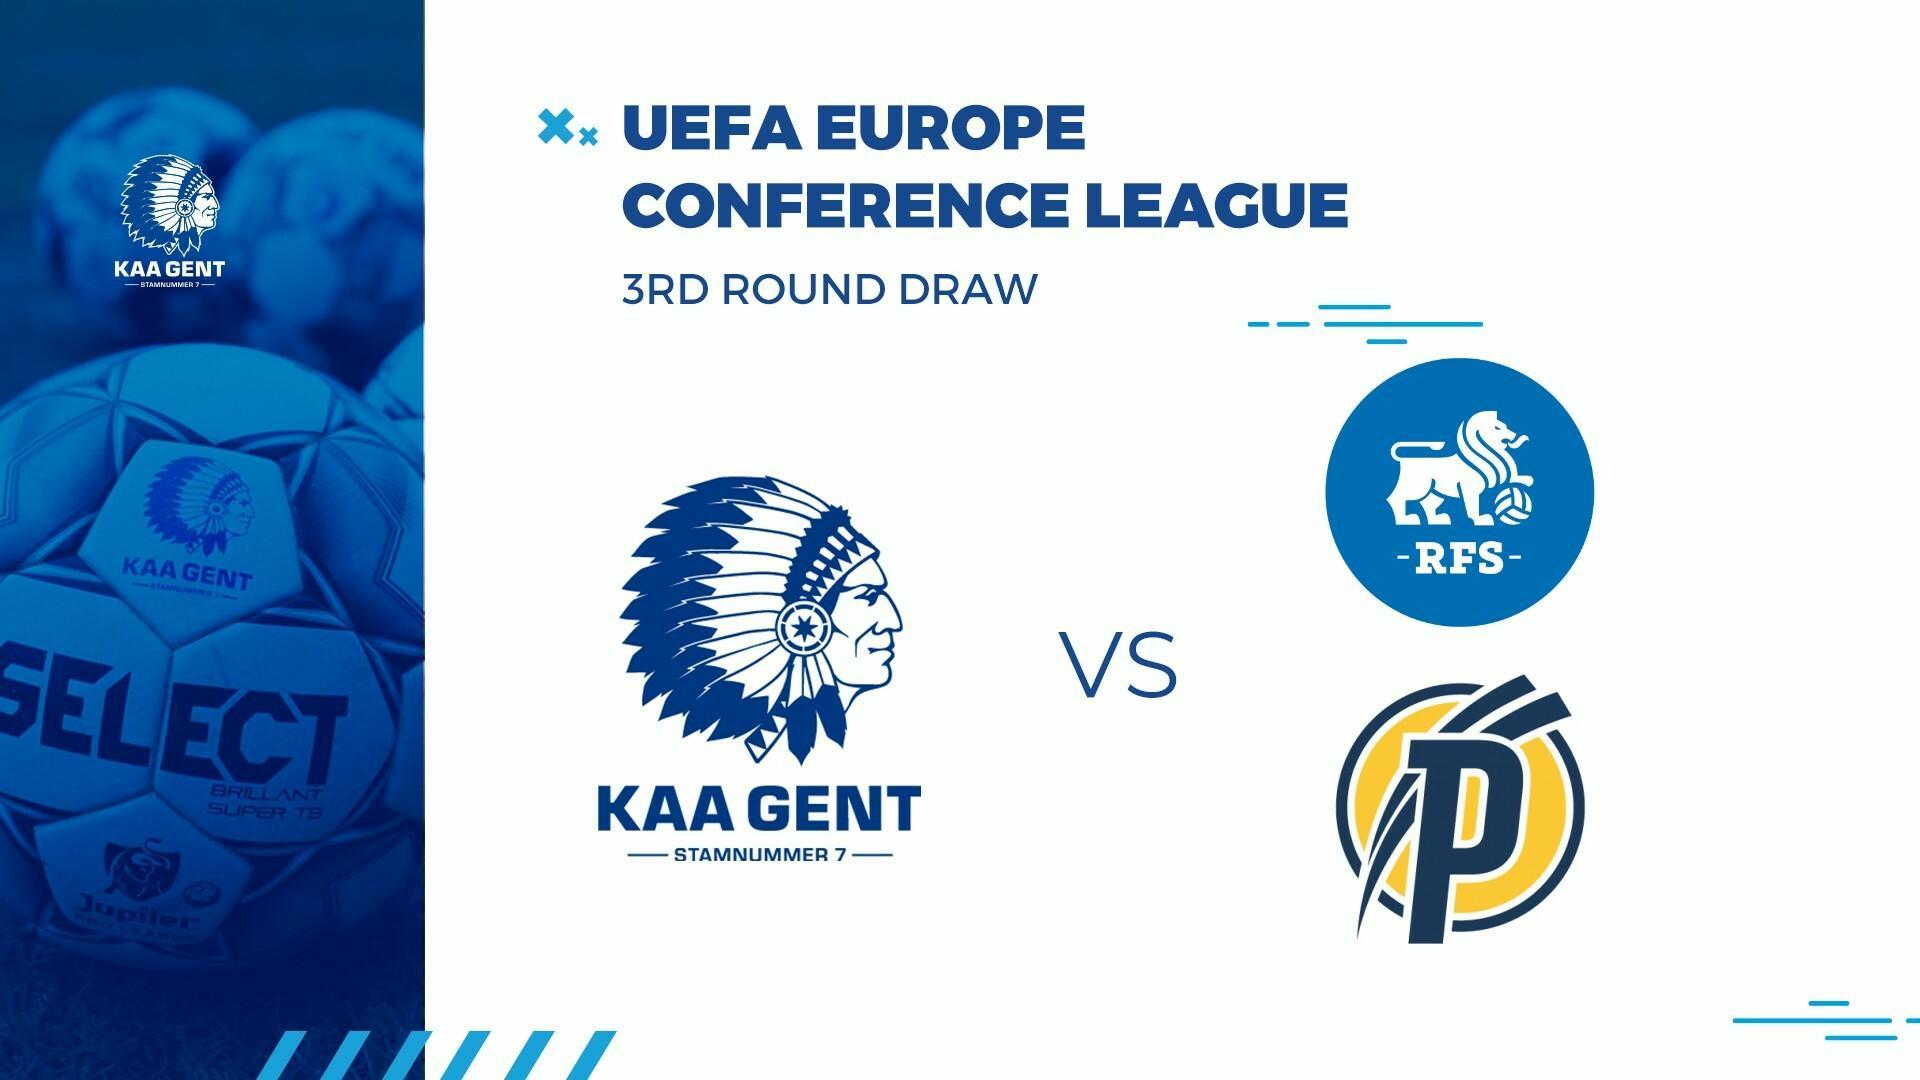 KAA Gent loot RFS of Puskás Akadémia in 3e voorronde Conference League